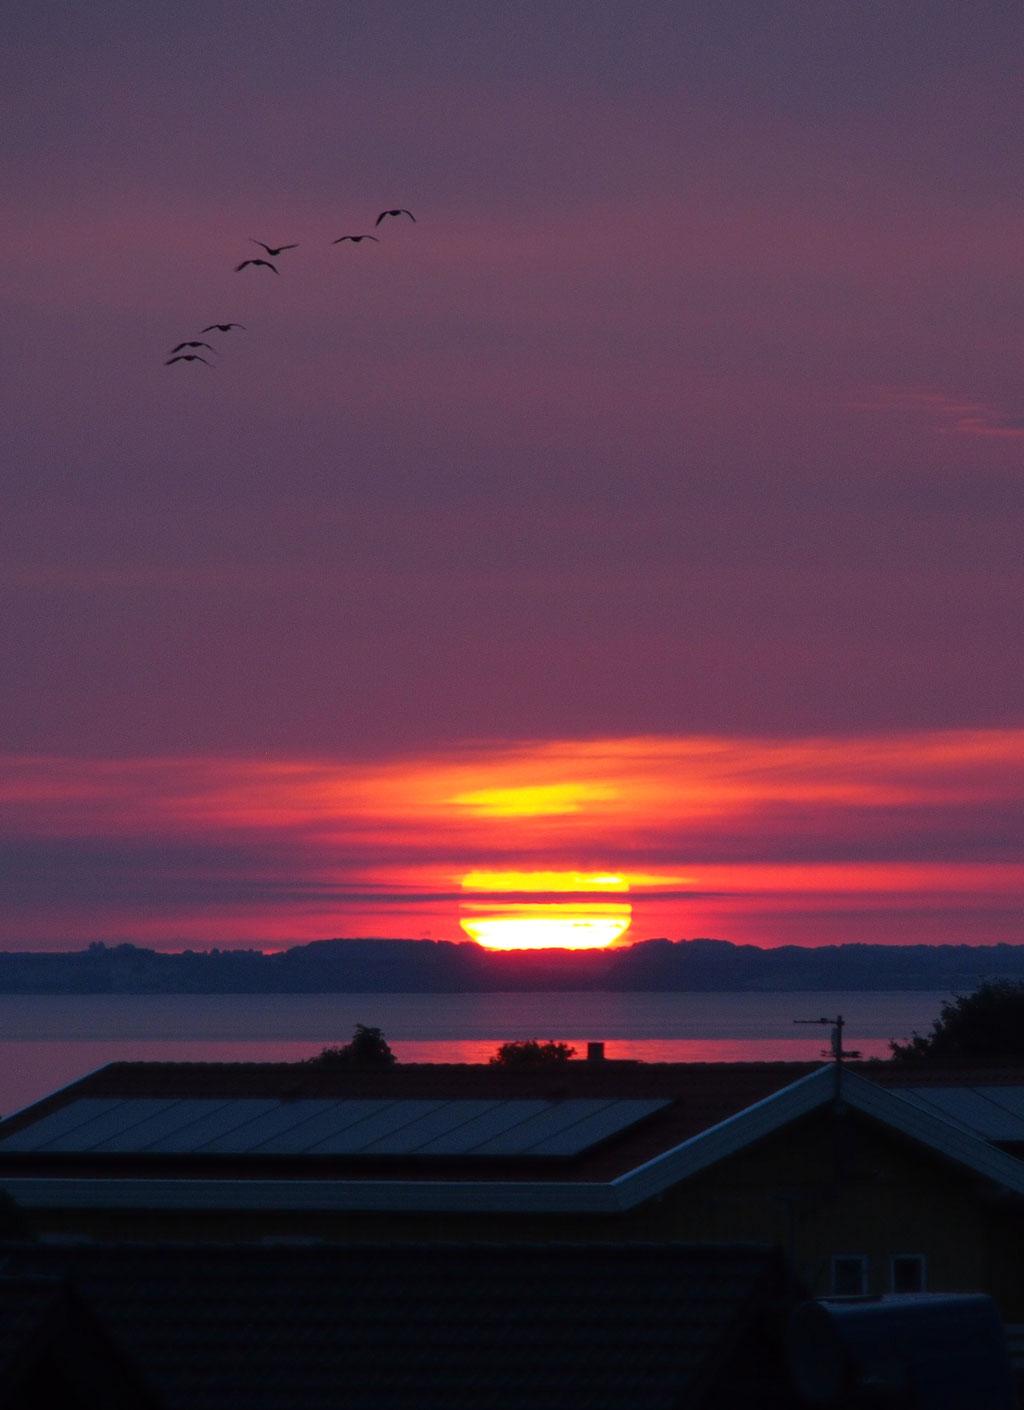 Sonnenaufgang bei Nordborg, Dänemark